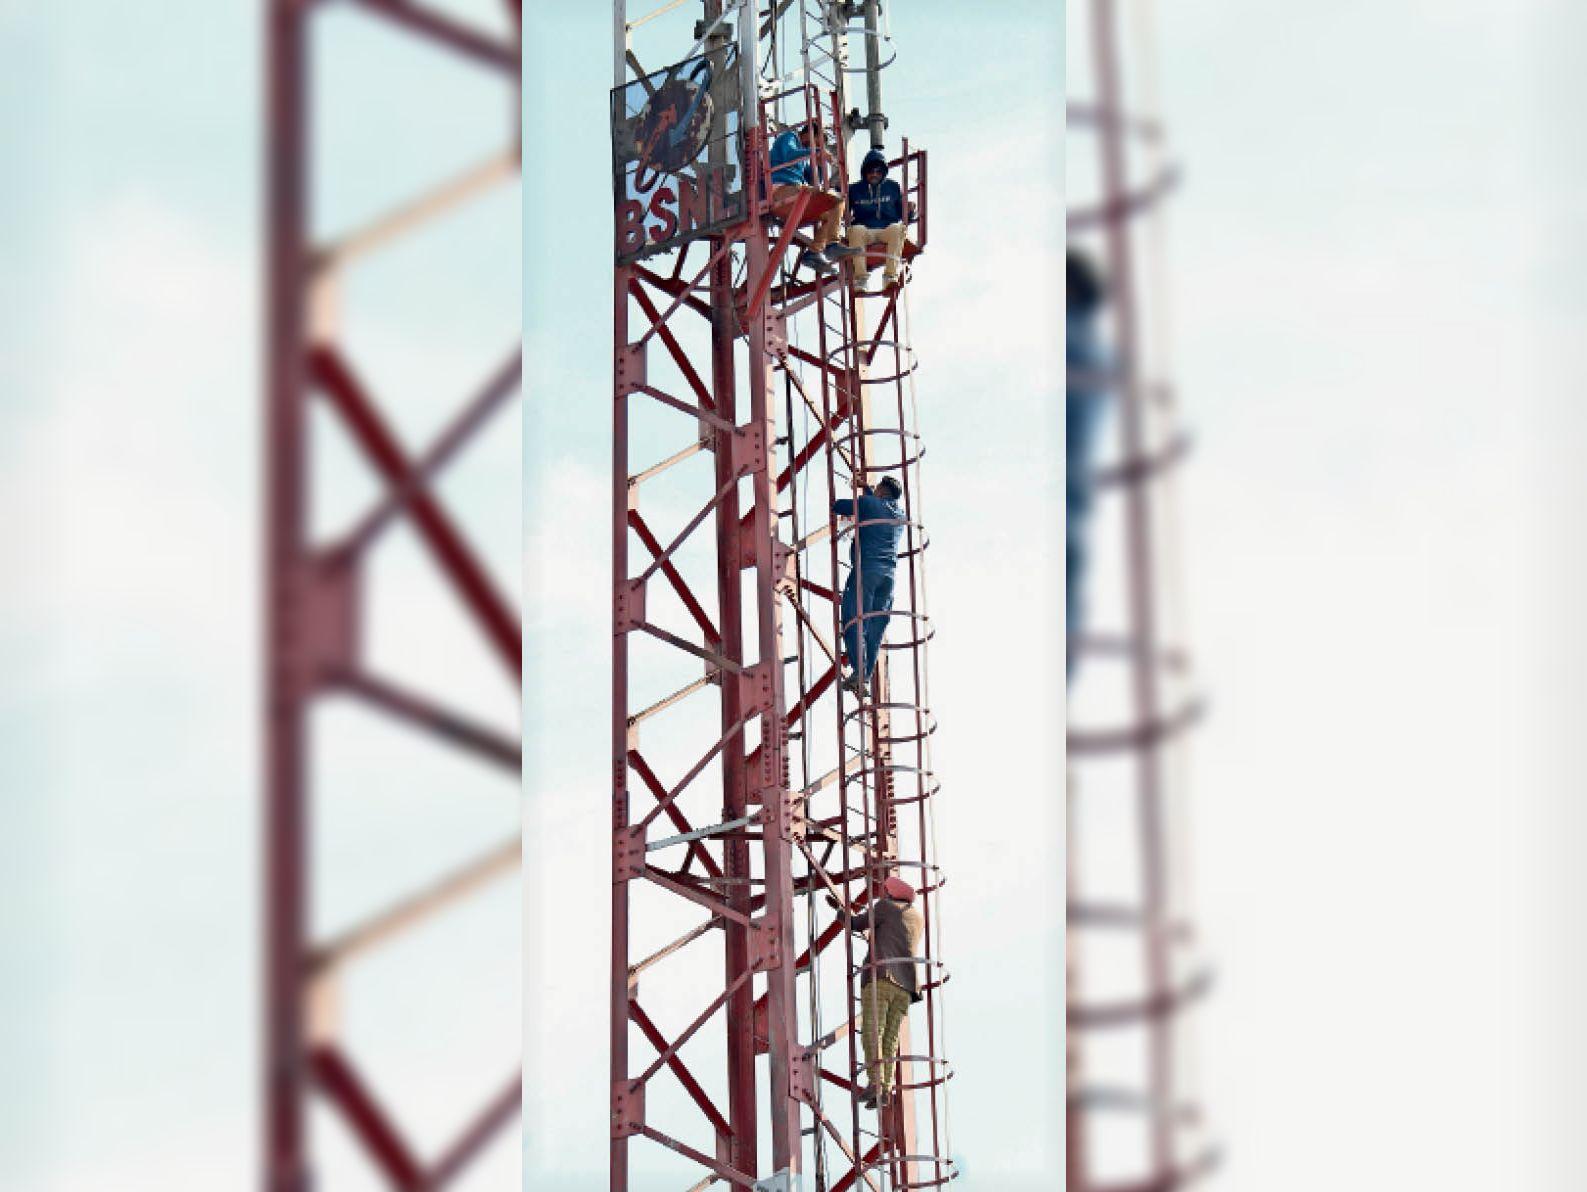 टावर पर चढ़ते बेरोजगार पीटीआई अध्यापक।